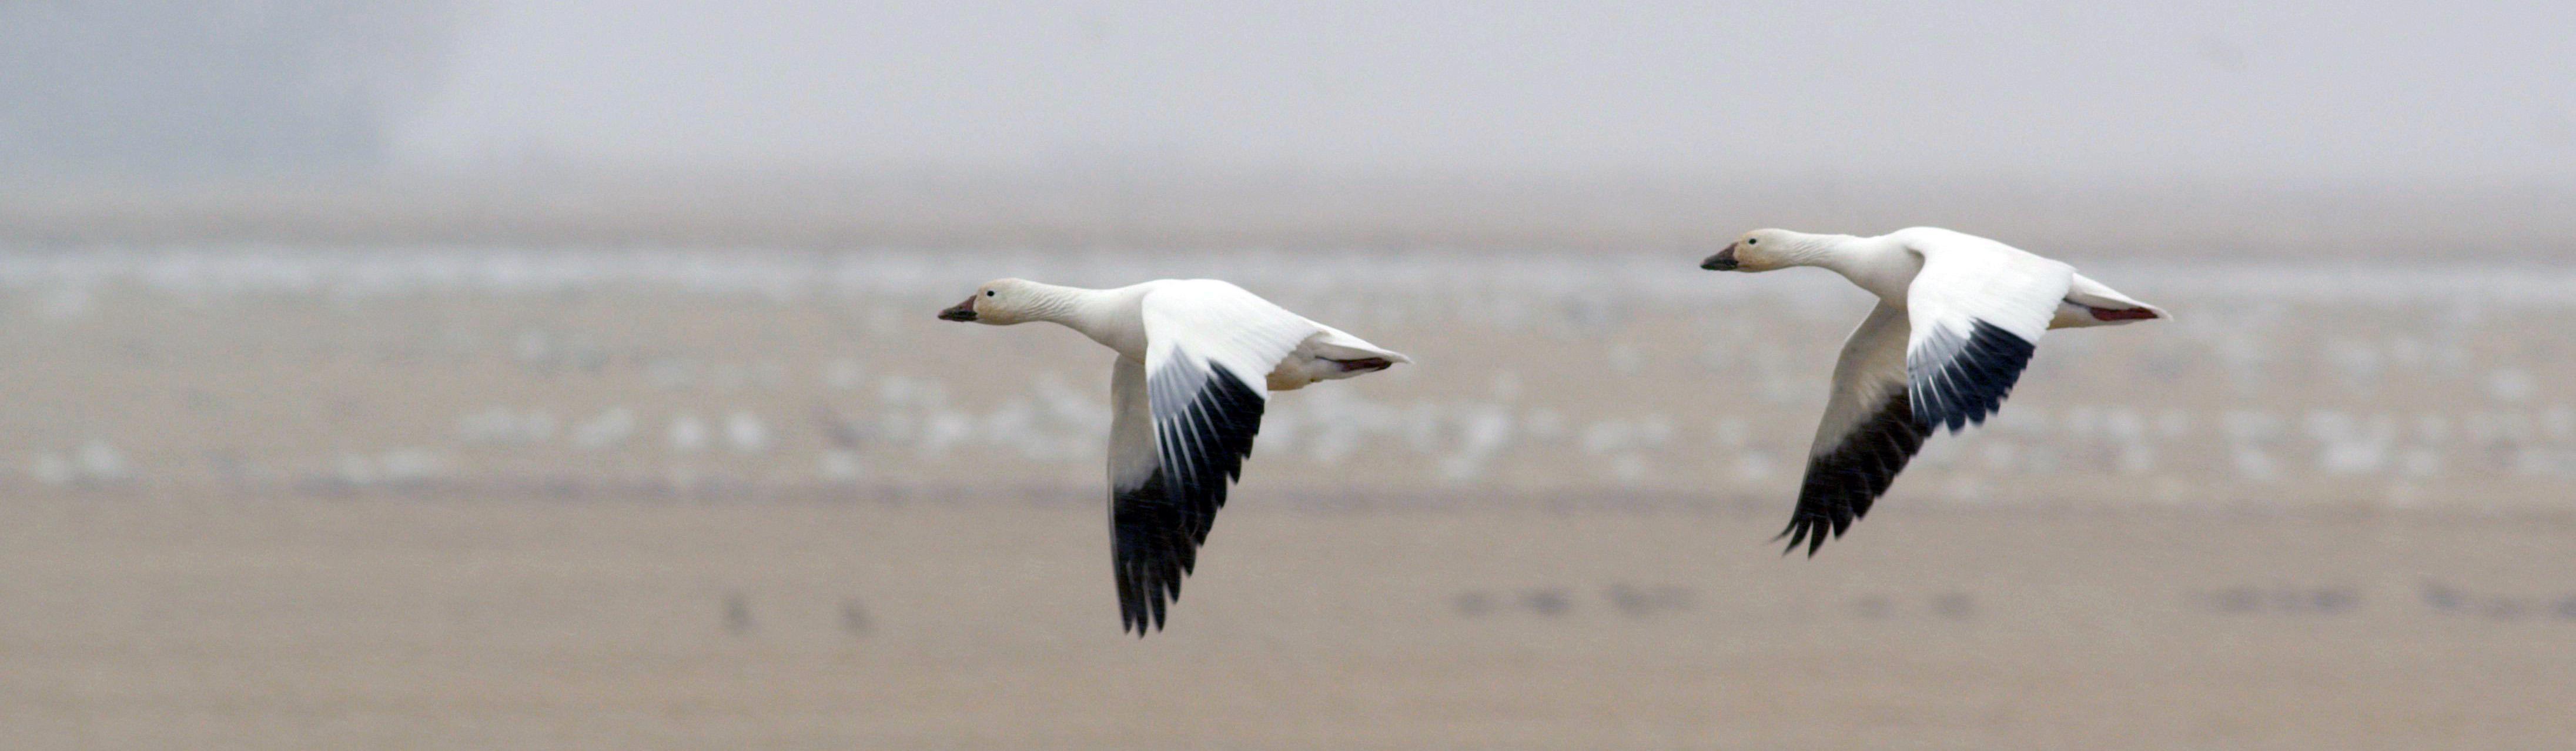 Snow Geese at Freezout Lake 1